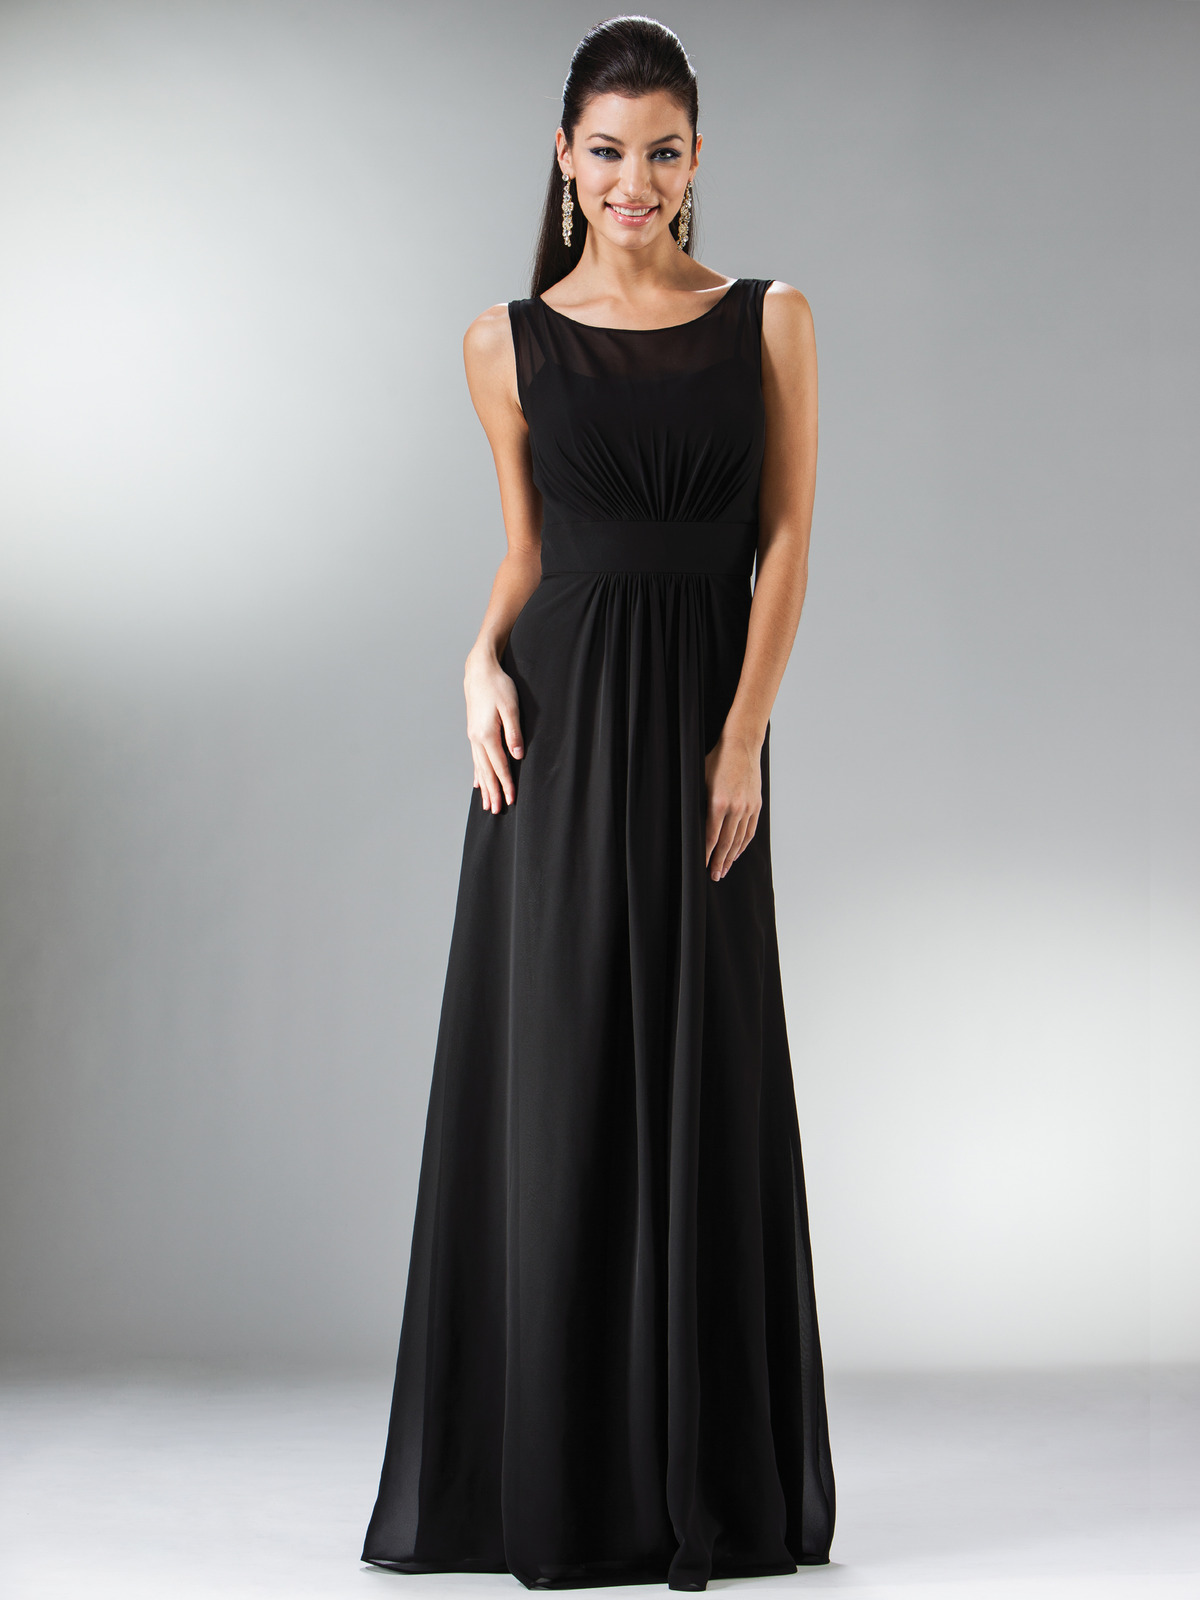 Black Tie Evening Dresses - Holiday Dresses